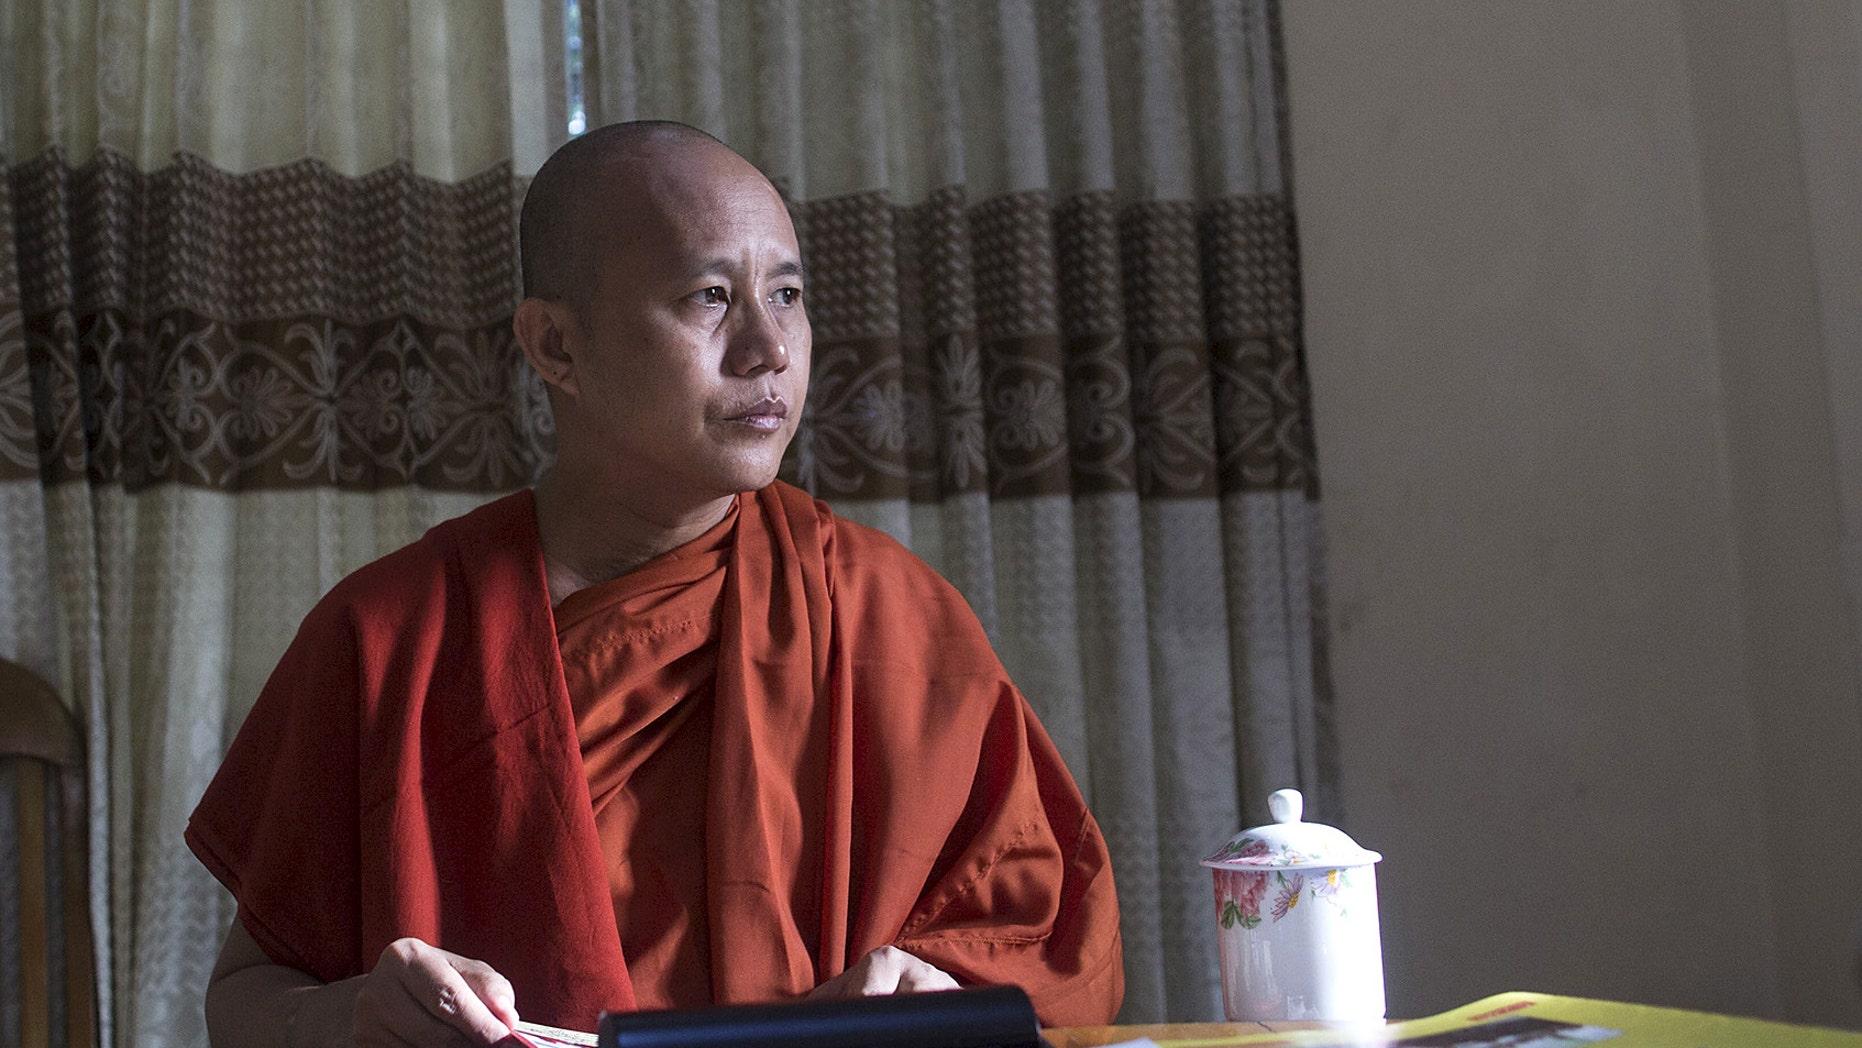 Myanmar's nationalist monk Wirathu during an interview in Yangon, Myanmar, on Oct. 4, 2015.